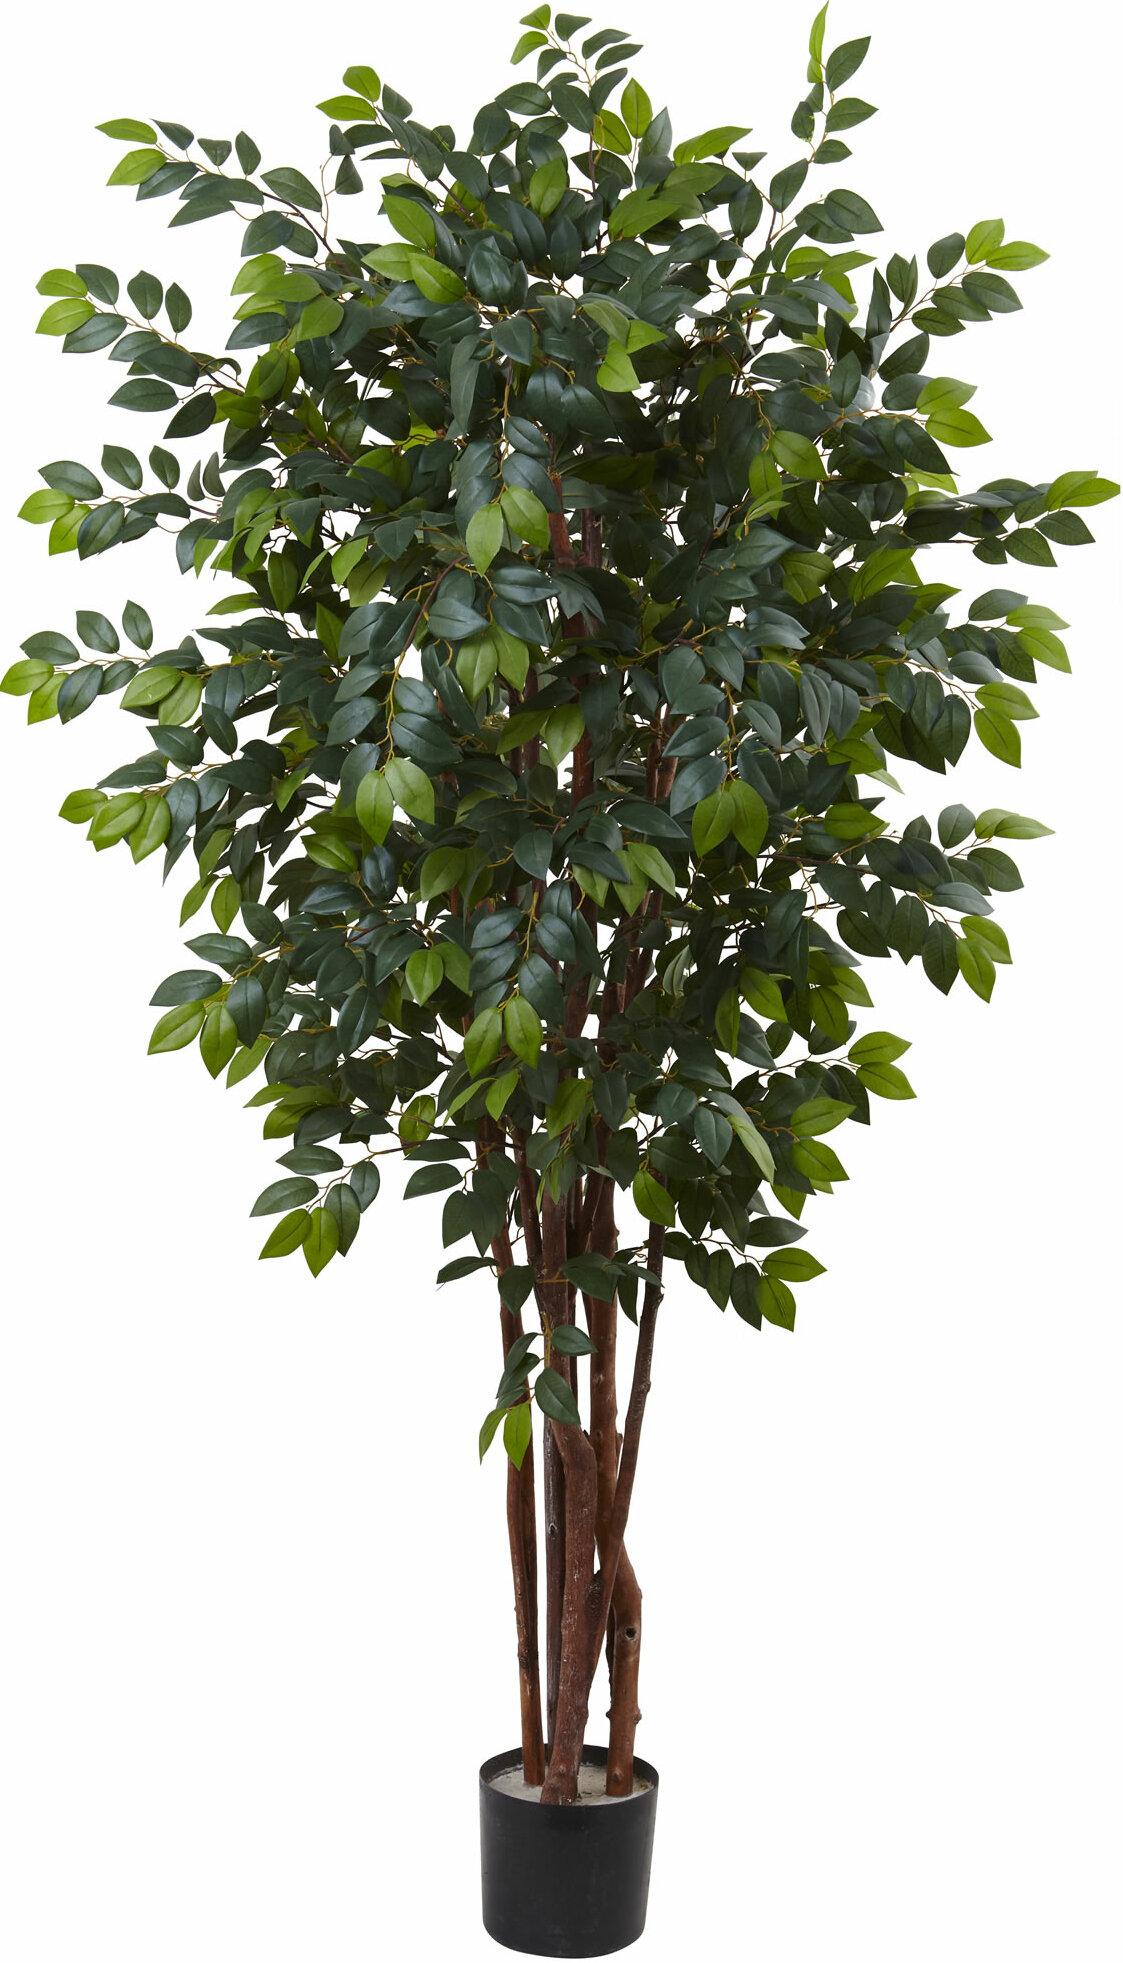 84 Artificial Ficus Tree In Pot Reviews Allmodern